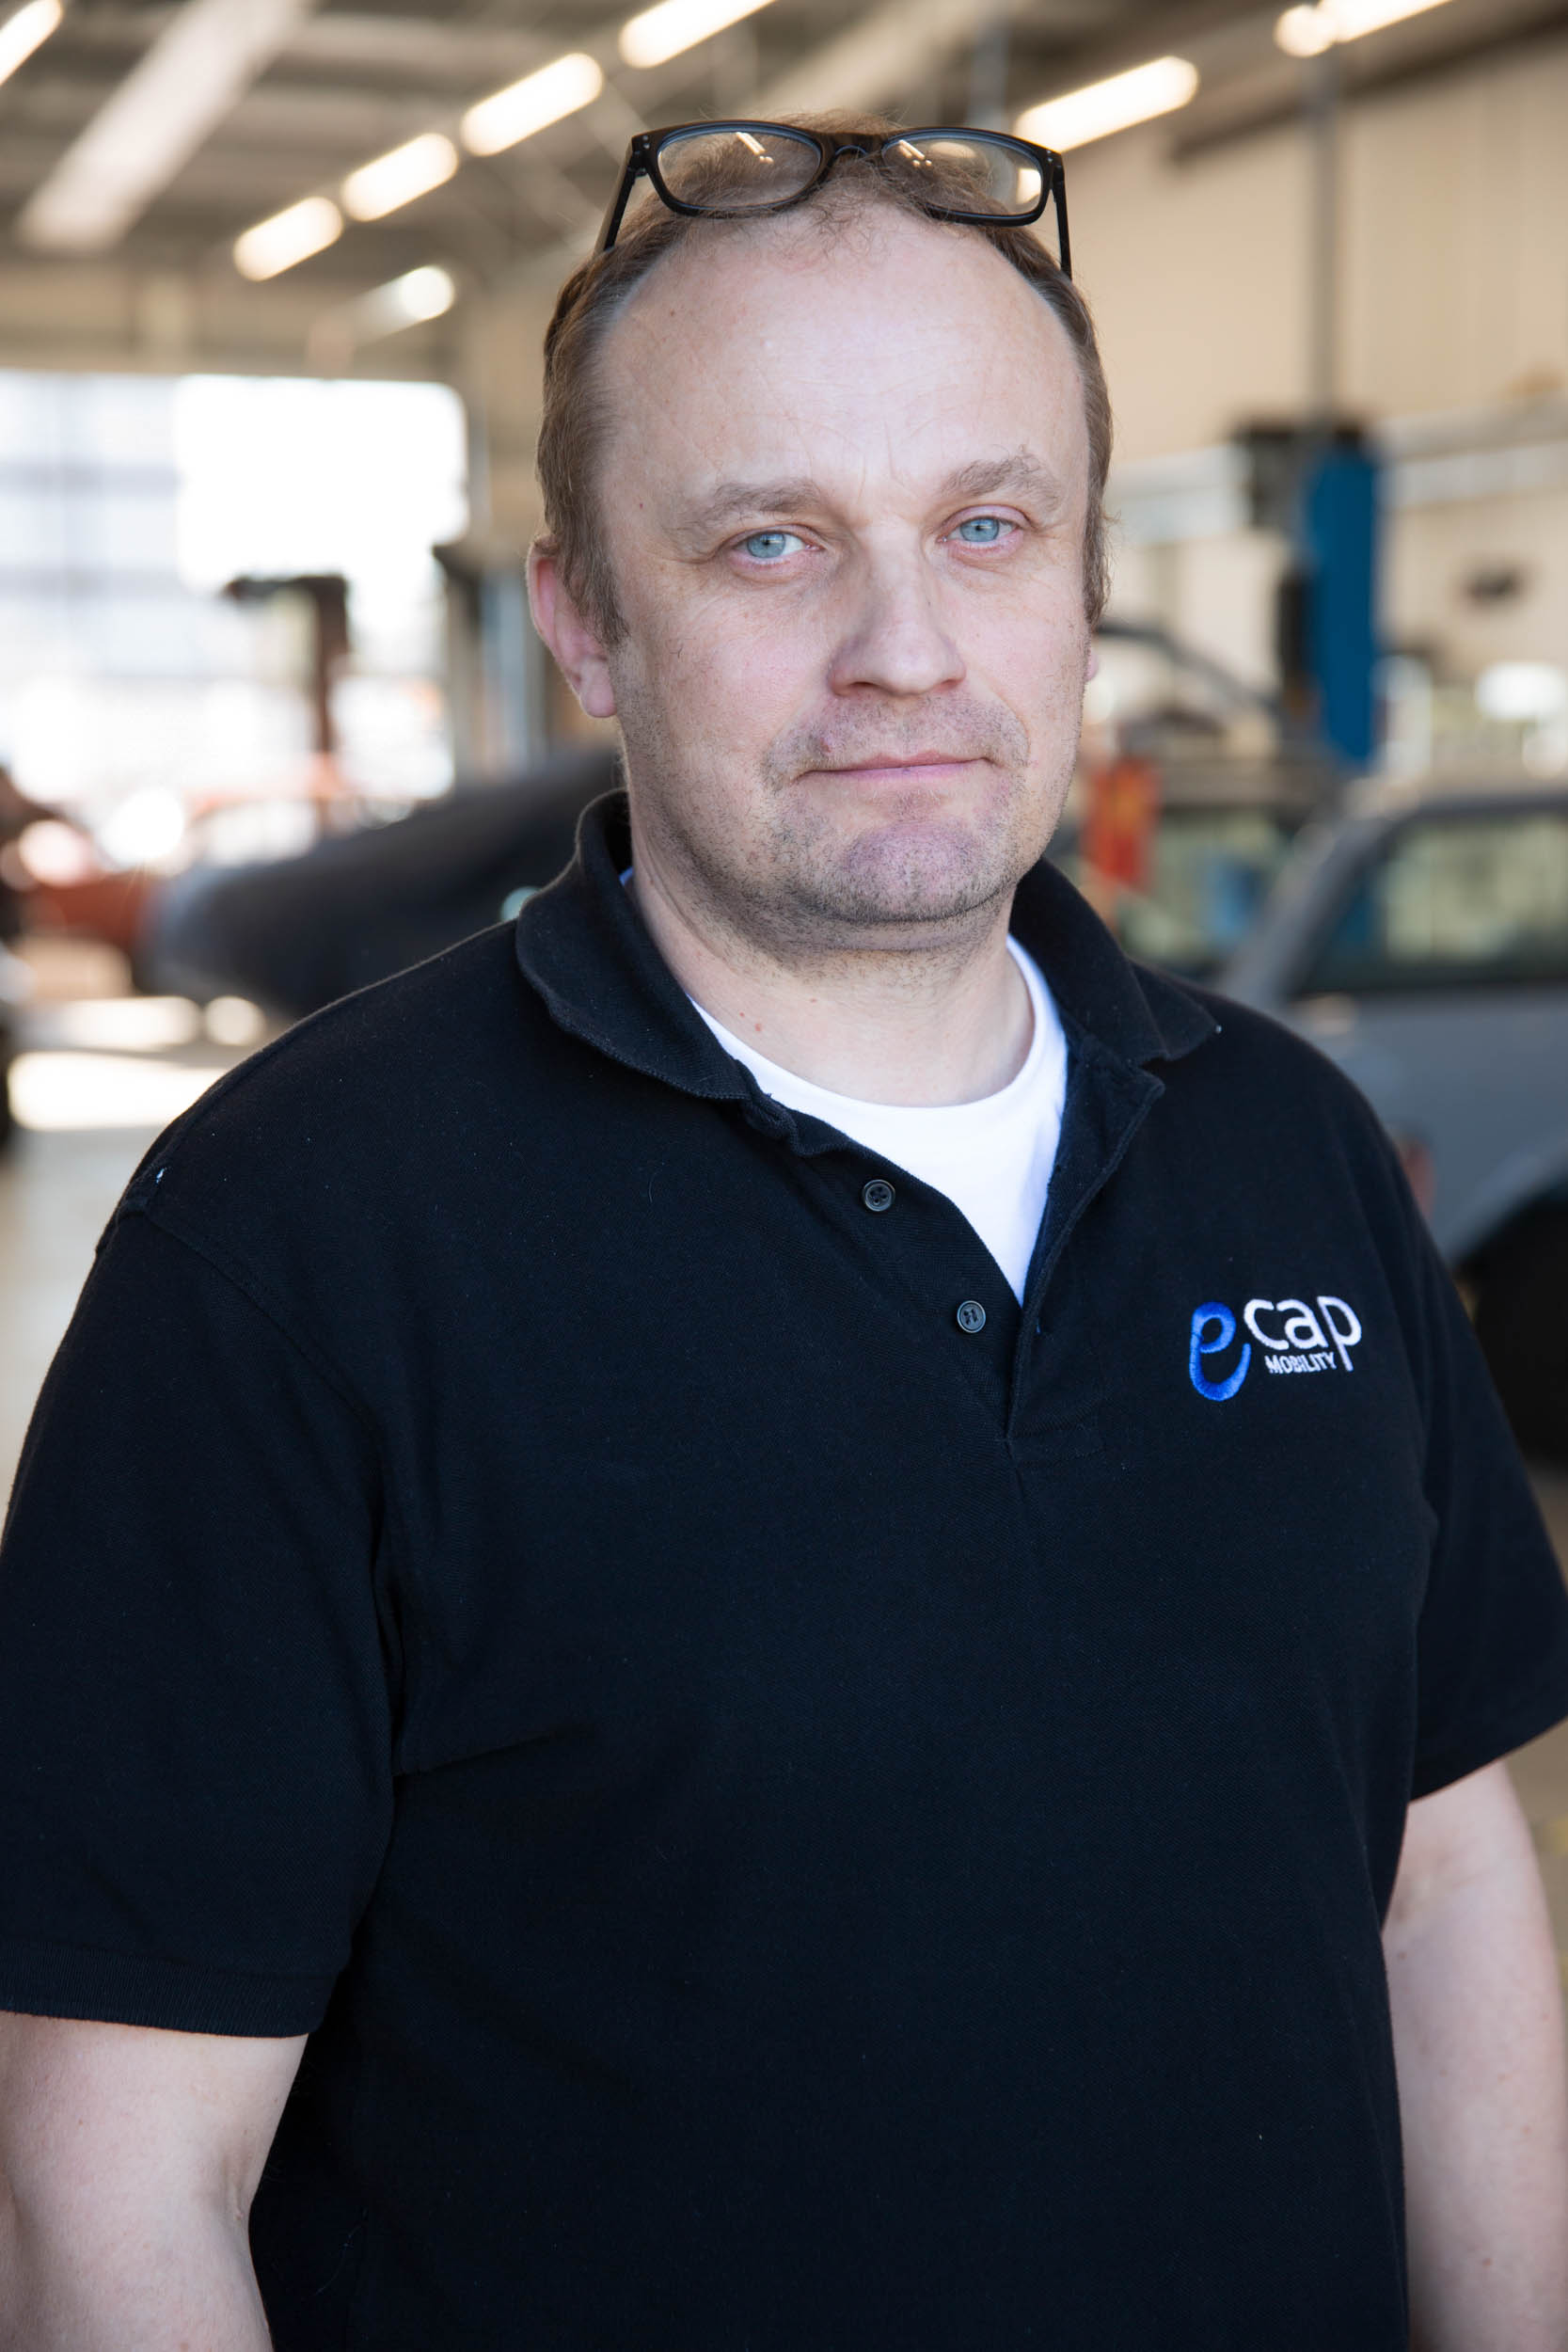 Pawel Pokrywinski | | Project Engineer ppo@ecap-mobility.com